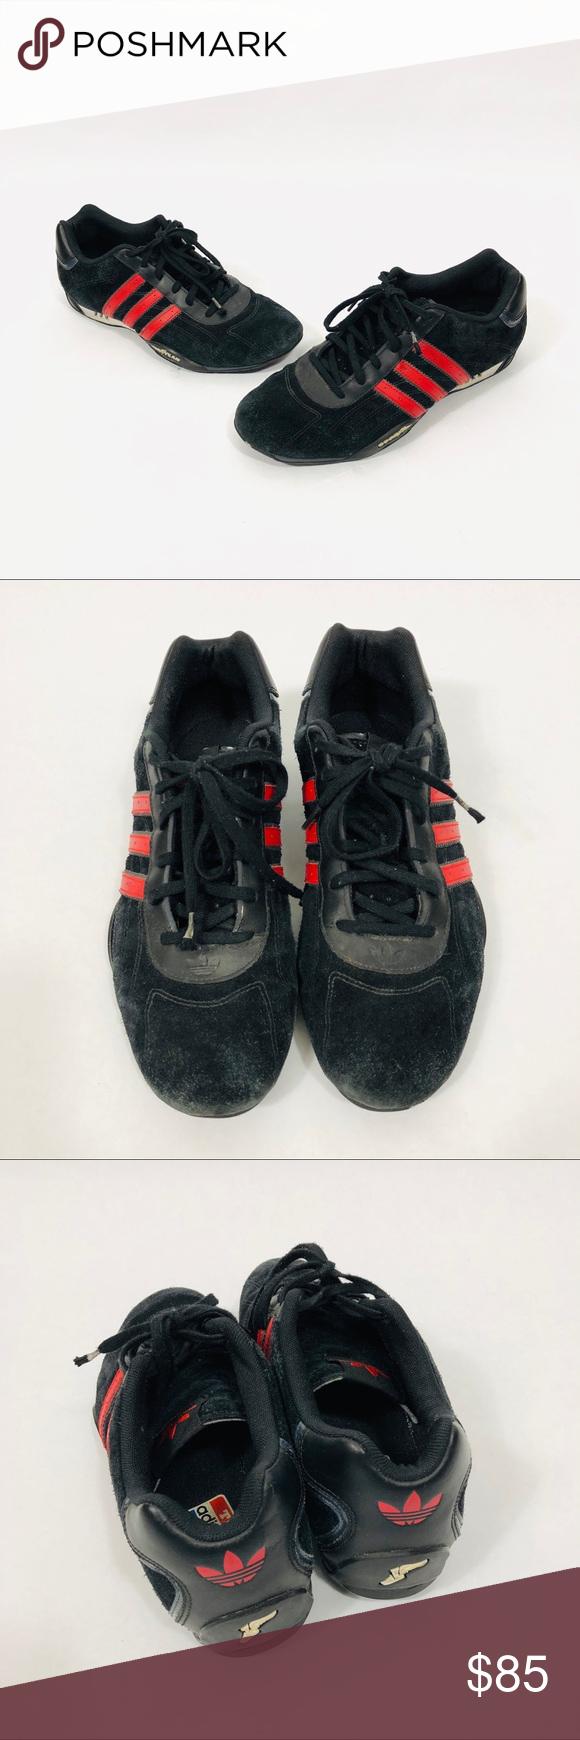 Adidas Adi Racer Low Goodyear Racing Shoes 9.5 Men's Adidas